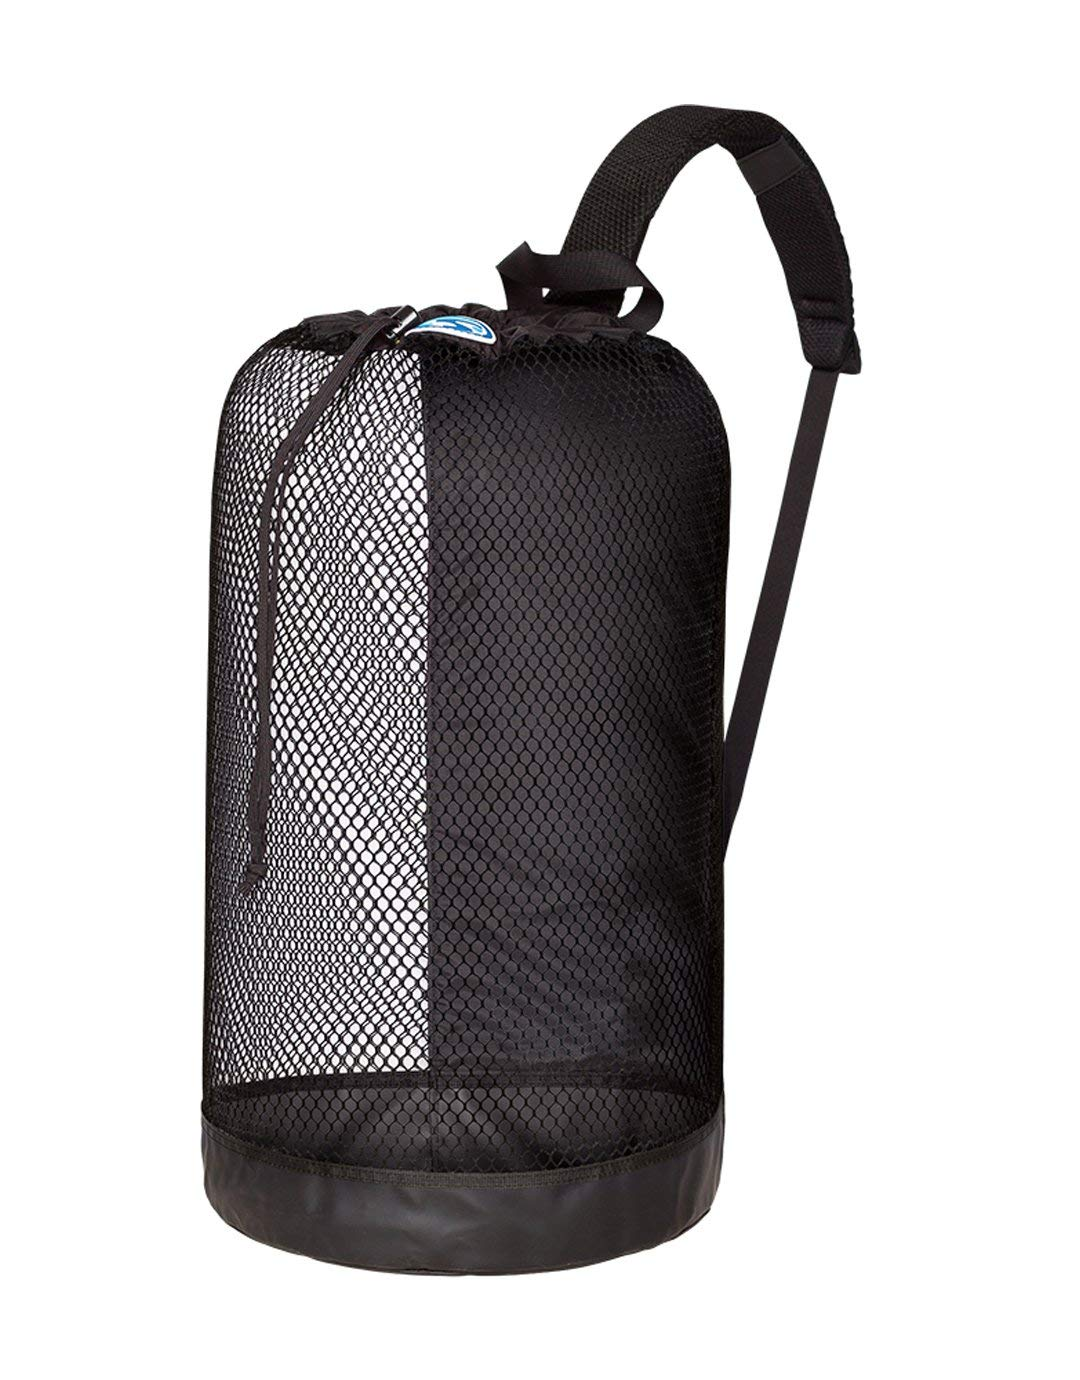 Tusa Large Roller Bag in Black /& DiveCatalogs Orange Whistle w//Lanyard /& Dive Flag Sticker